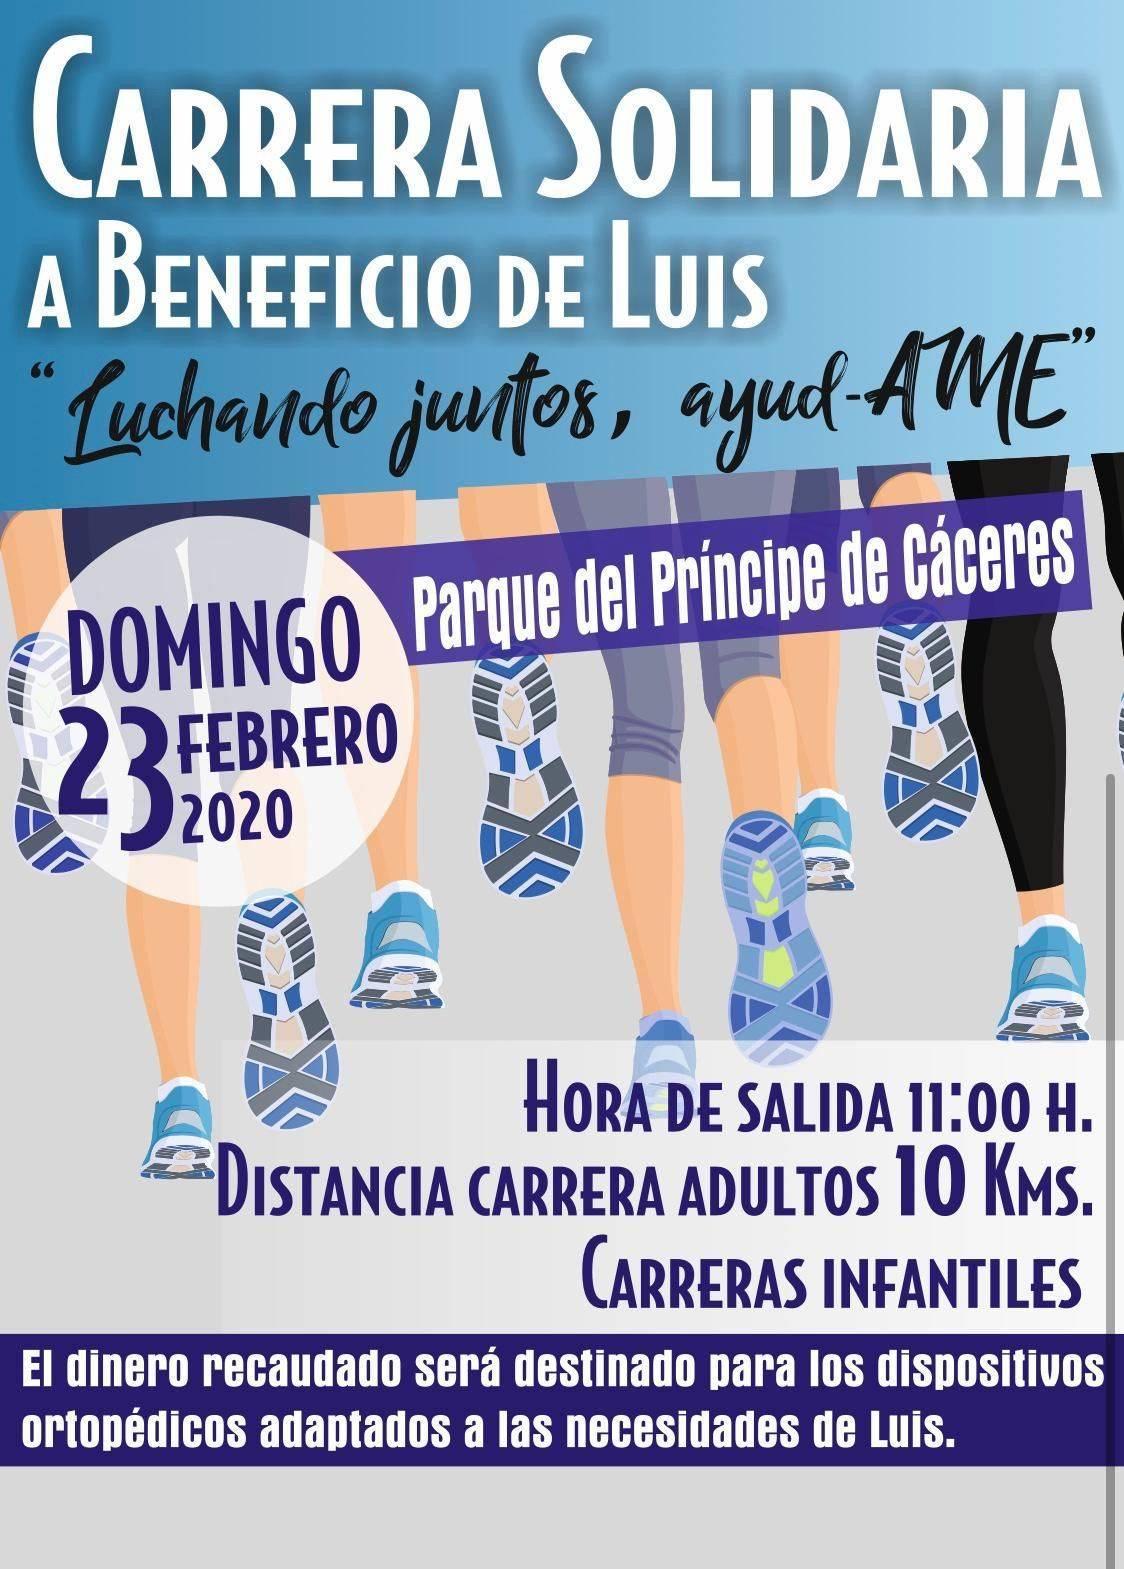 Carrera solidaria a beneficio de Luis 2020 - Cáceres